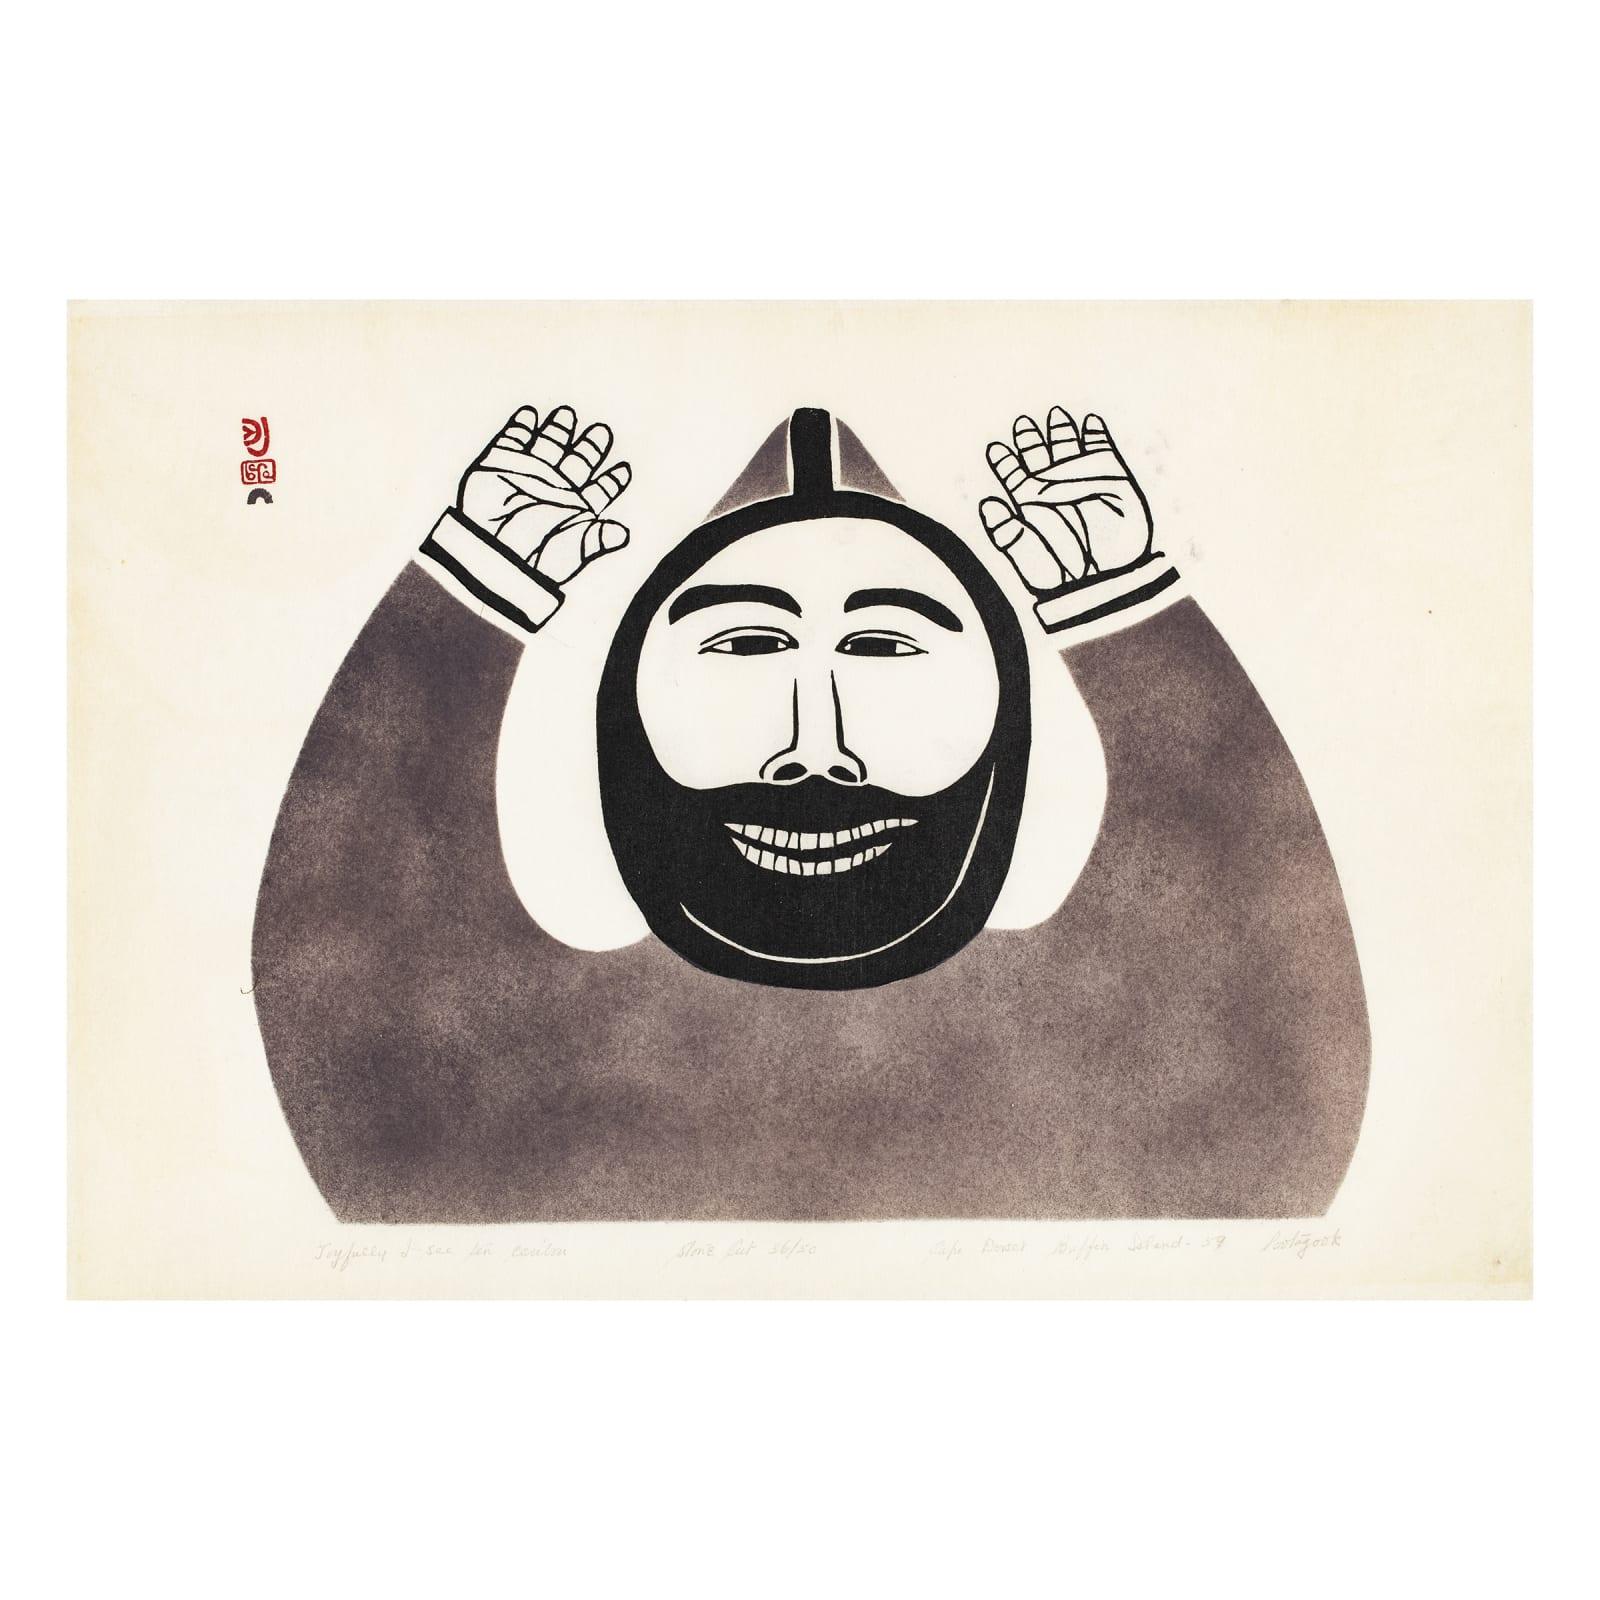 JOSEPHIE POOTOOGOOK (1887-1958) KINNGAIT (CAPE DORSET) Joyfully I See Ten Caribou, 1959 REALIZED: $13,200